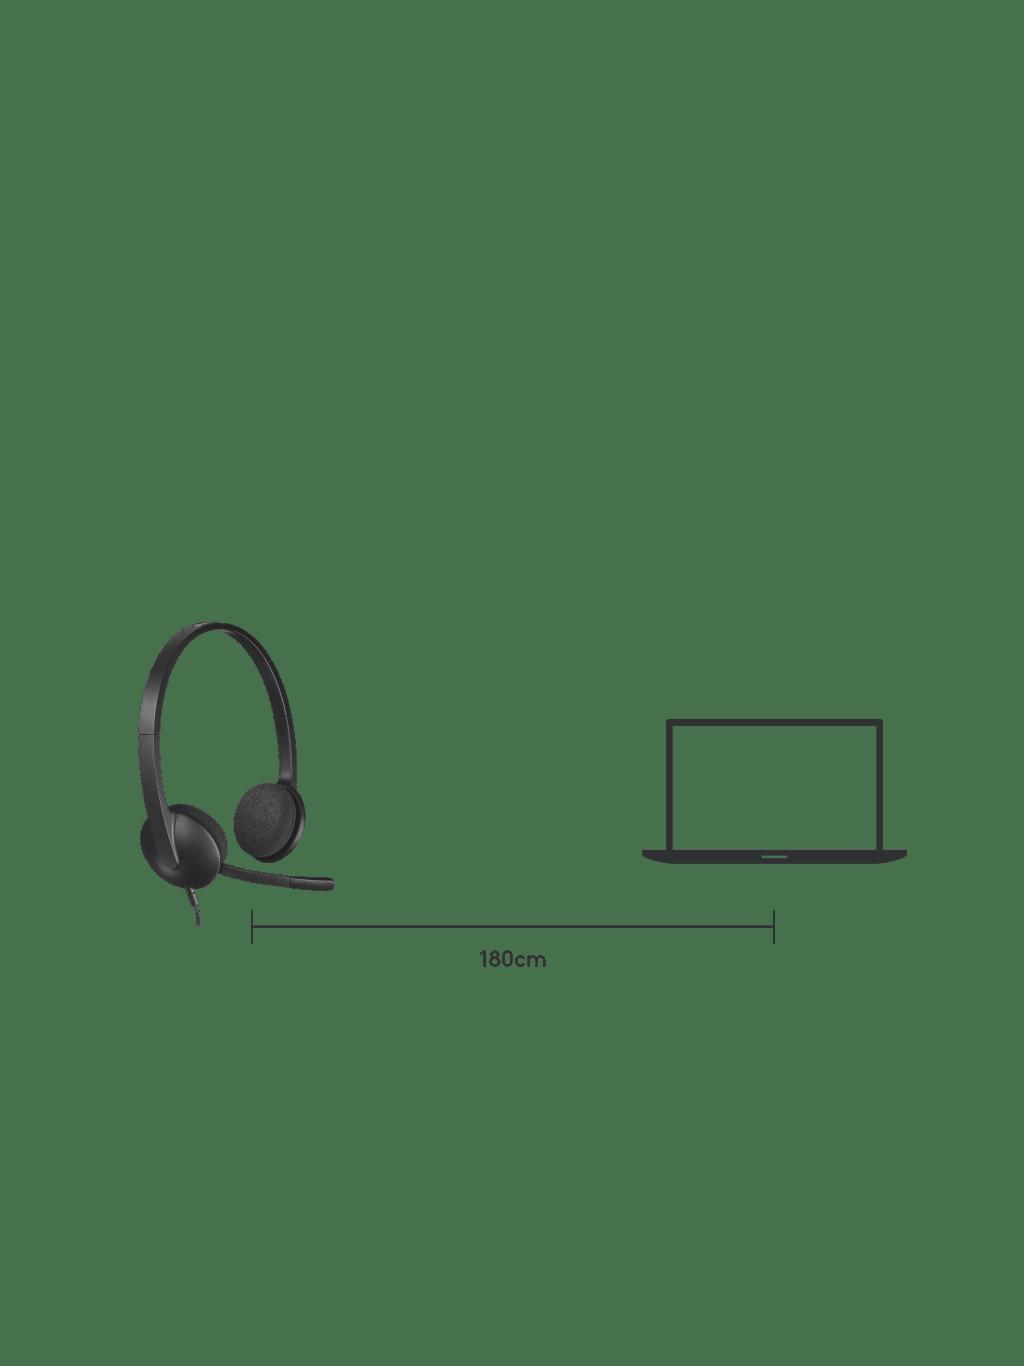 h340-feature-01-cm-tablet